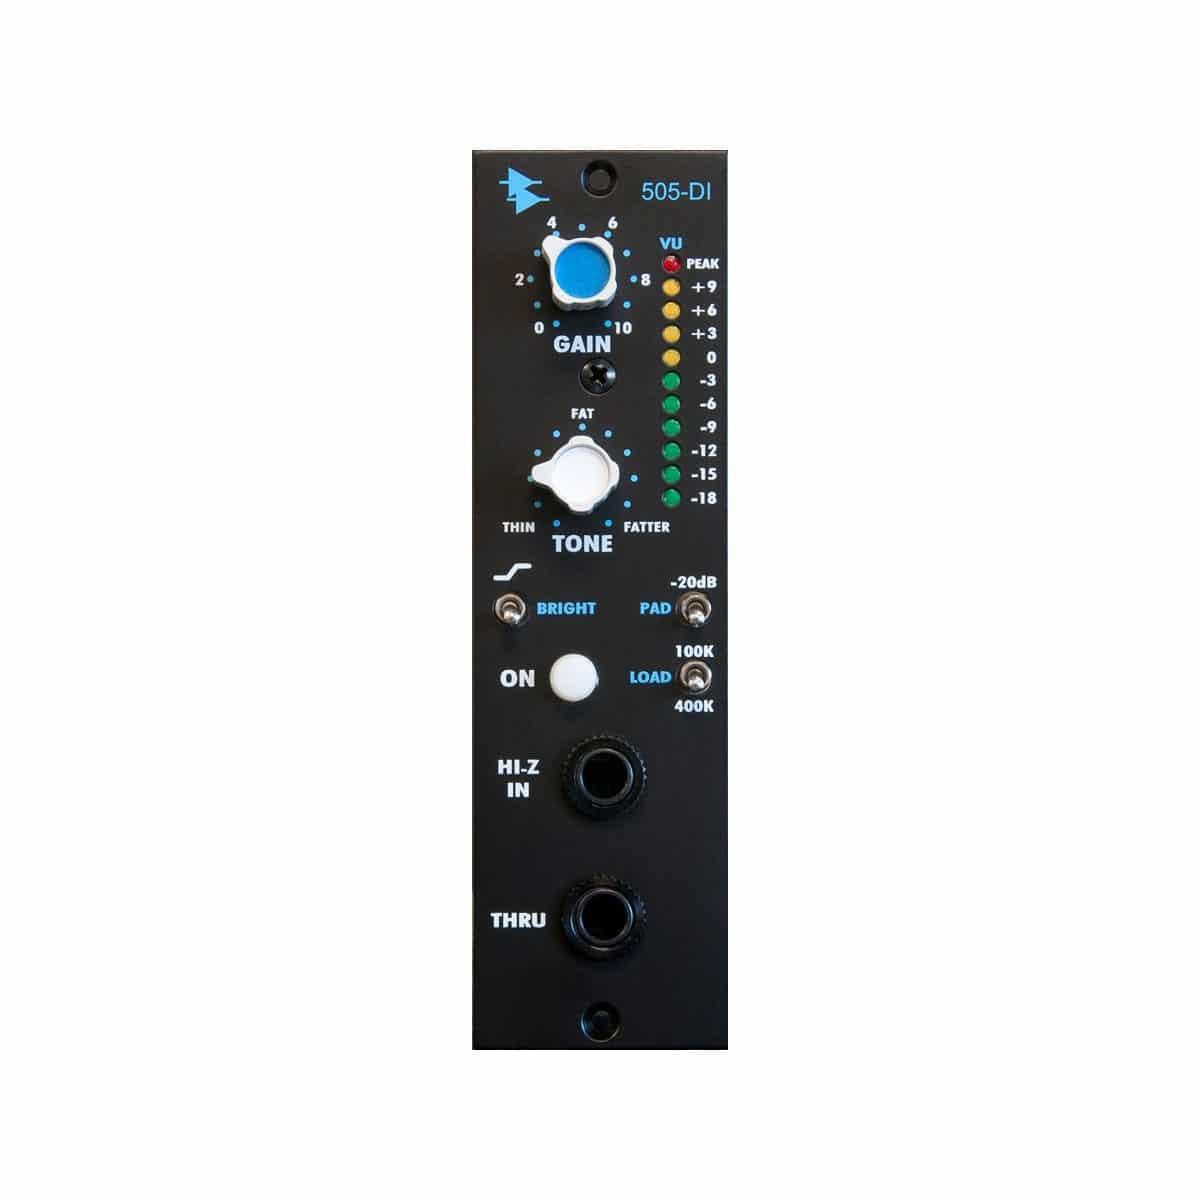 API 505 DI 01 D.I./Reamp, Outboard, Pro Audio